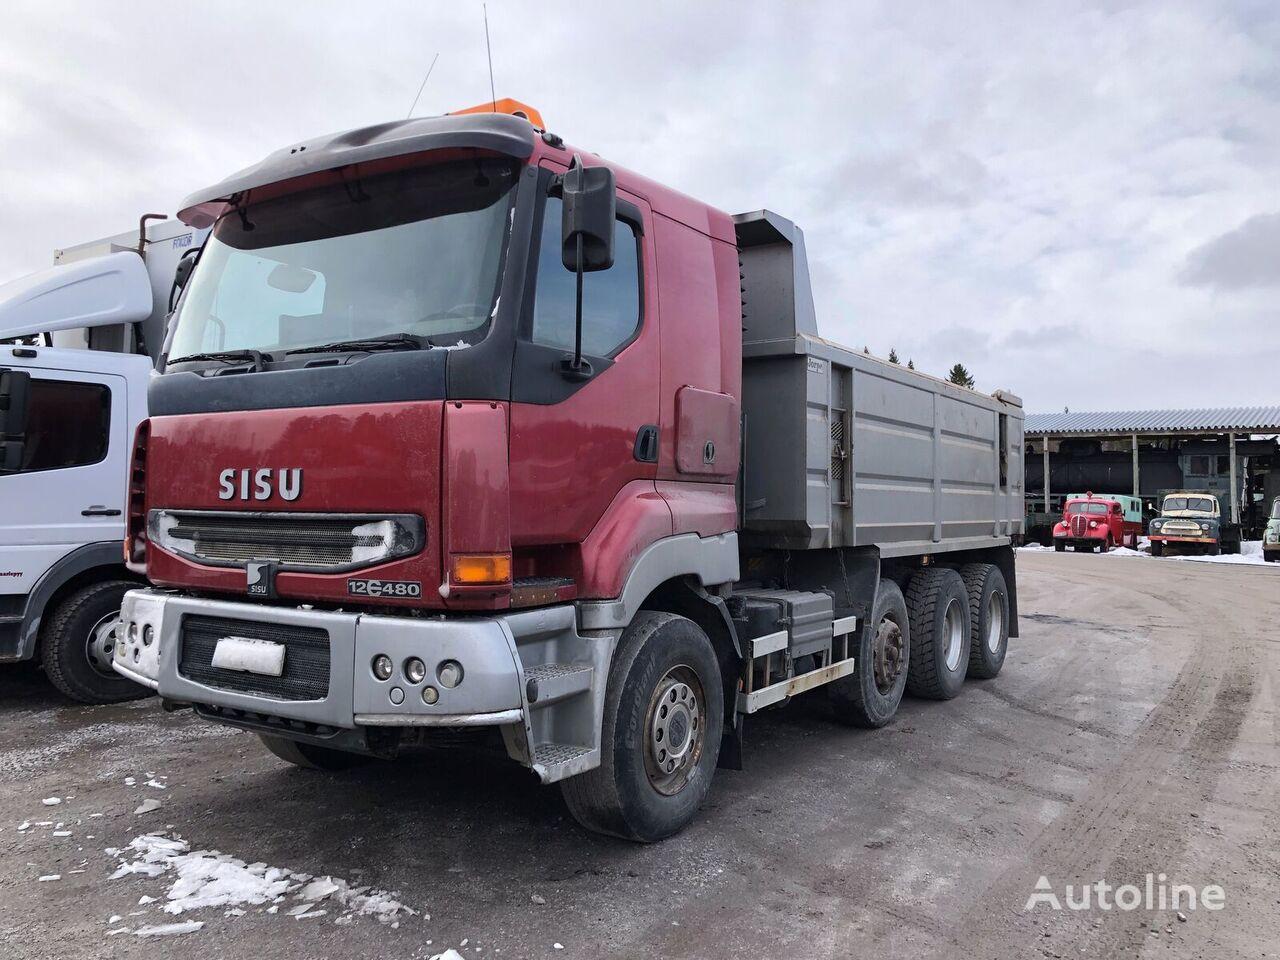 SISU E12 dump truck